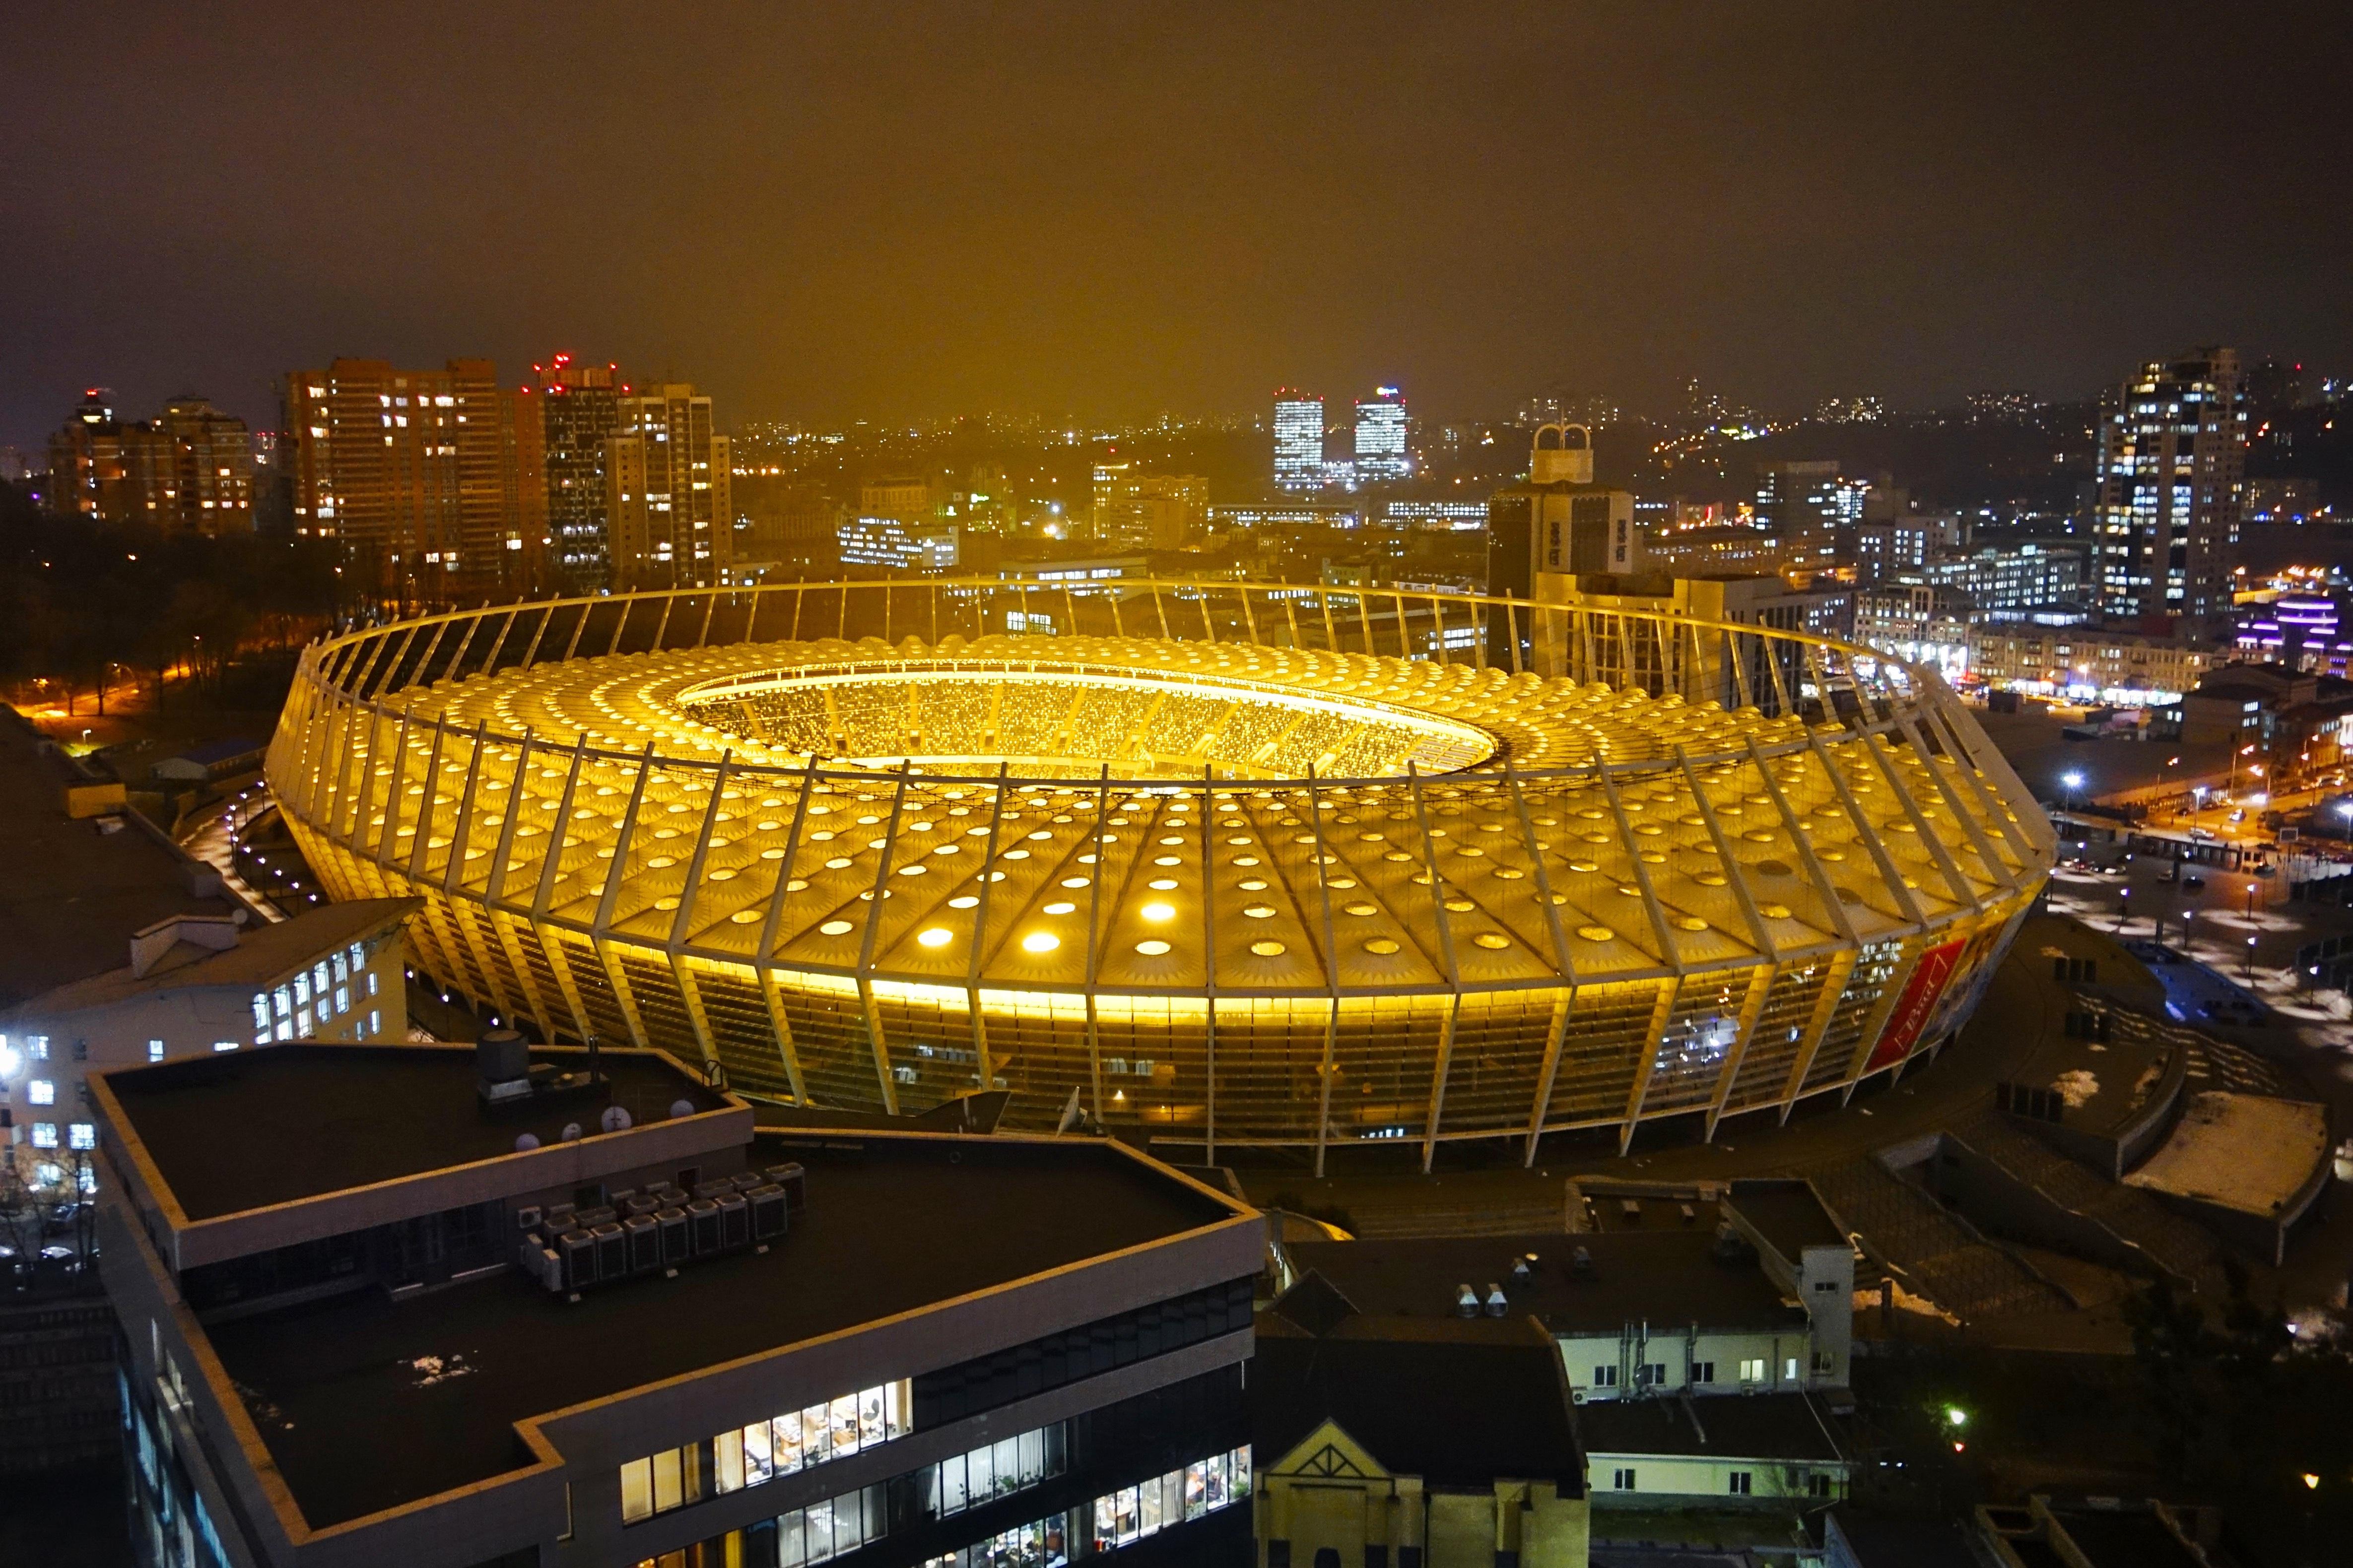 Free Images : structure, city, arena, ukraine, kiev, olympic stadium ...